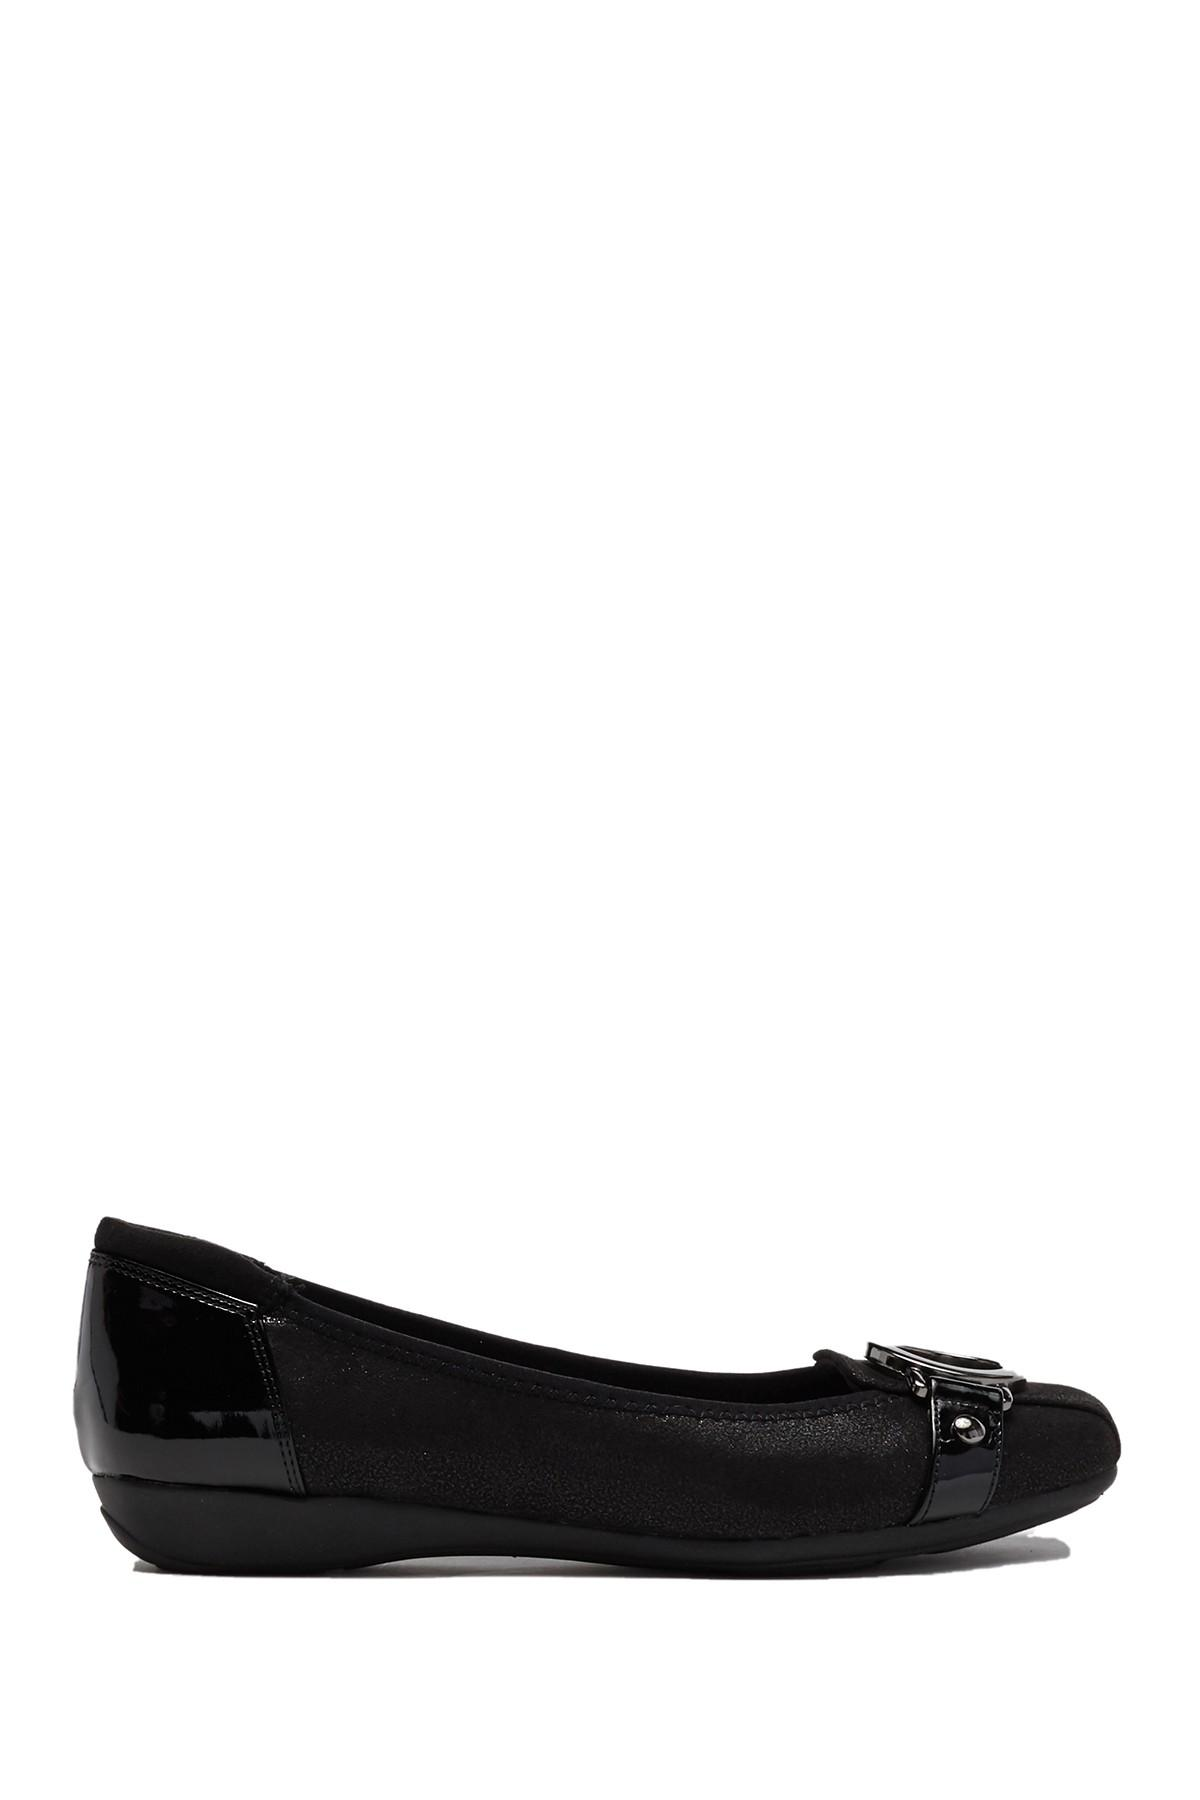 d388c7048af Anne Klein - Black Akuther Slip-on Flat - Lyst. View fullscreen